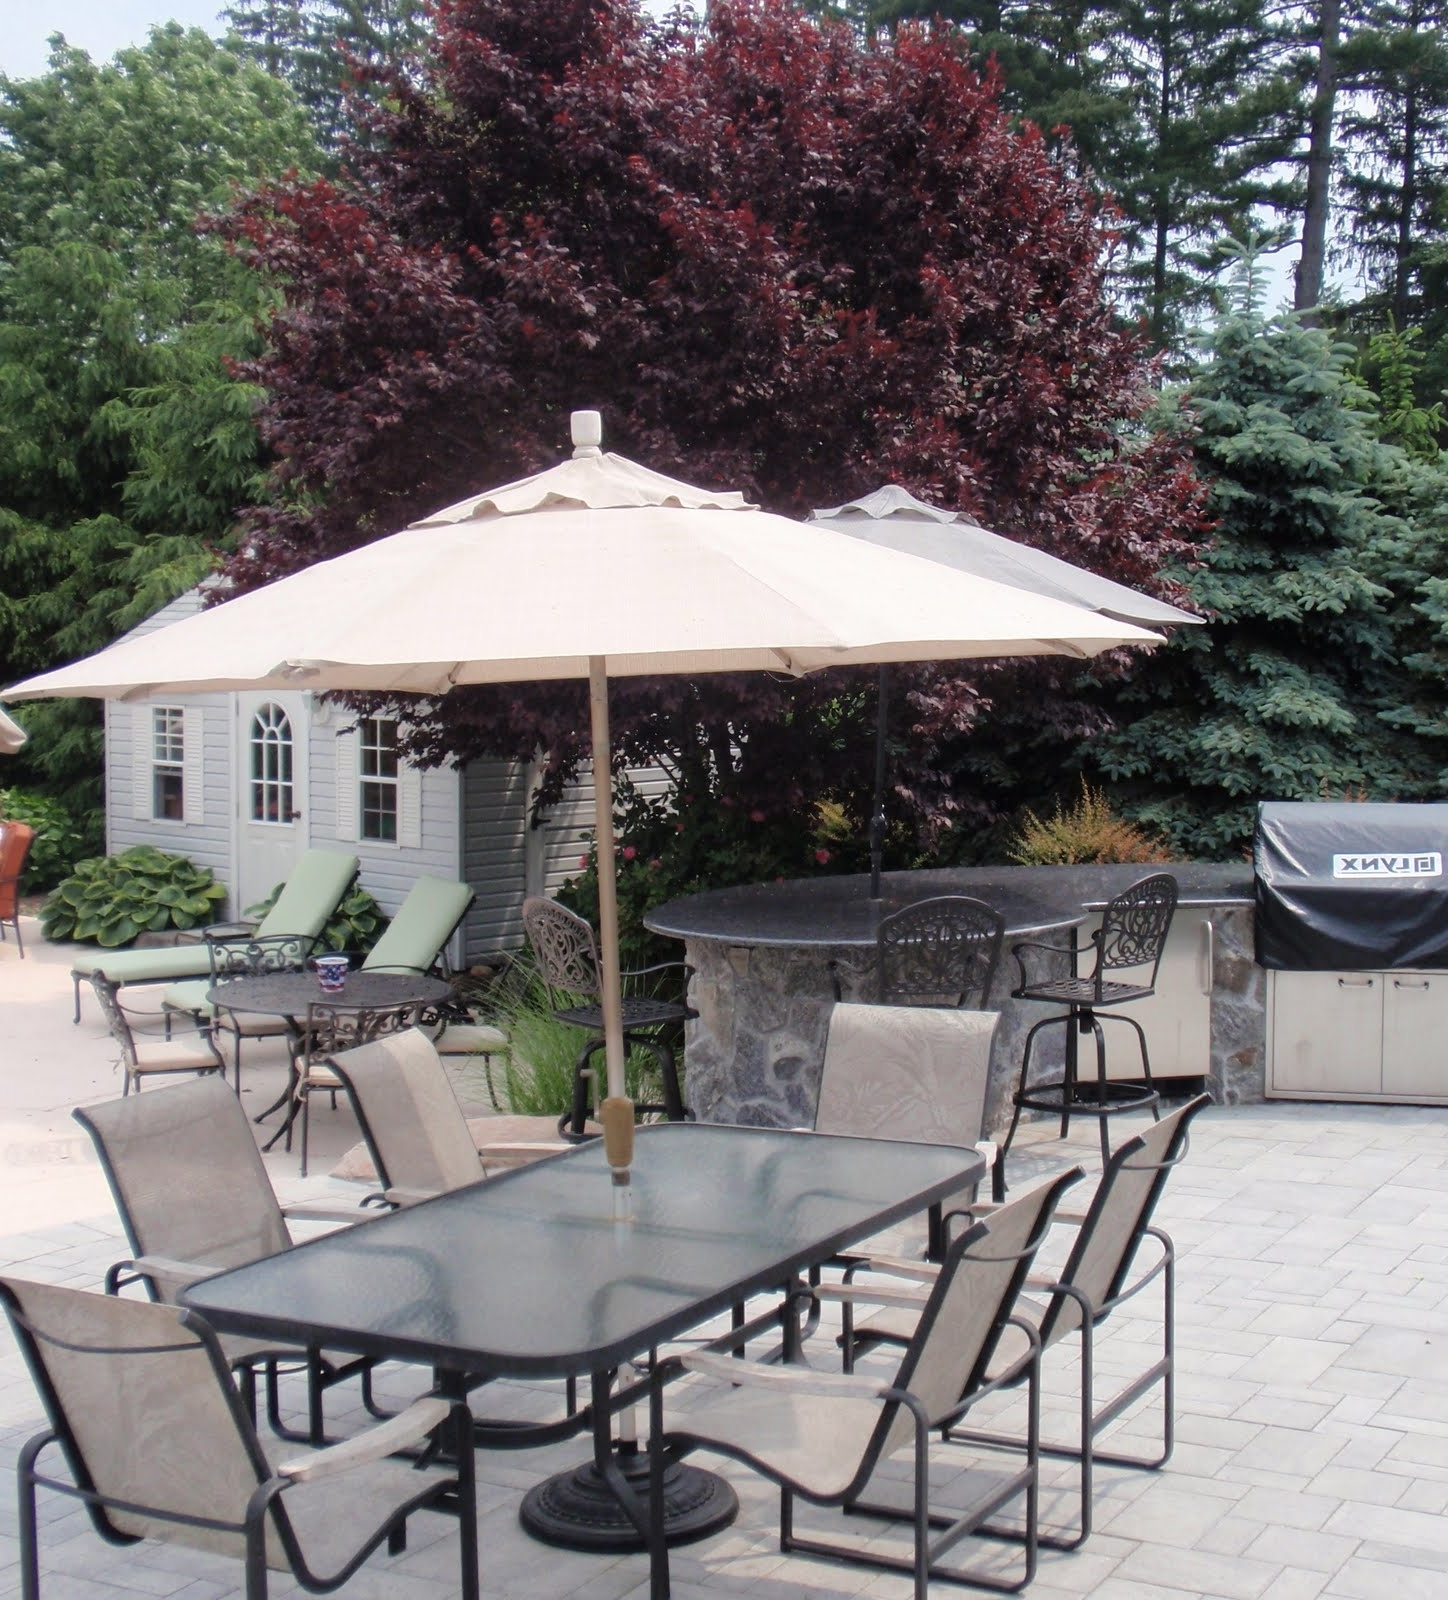 Most Recently Released Patio Umbrellas For Tables In Garden: Enchanting Outdoor Patio Decor Ideas With Patio Umbrellas (View 6 of 20)